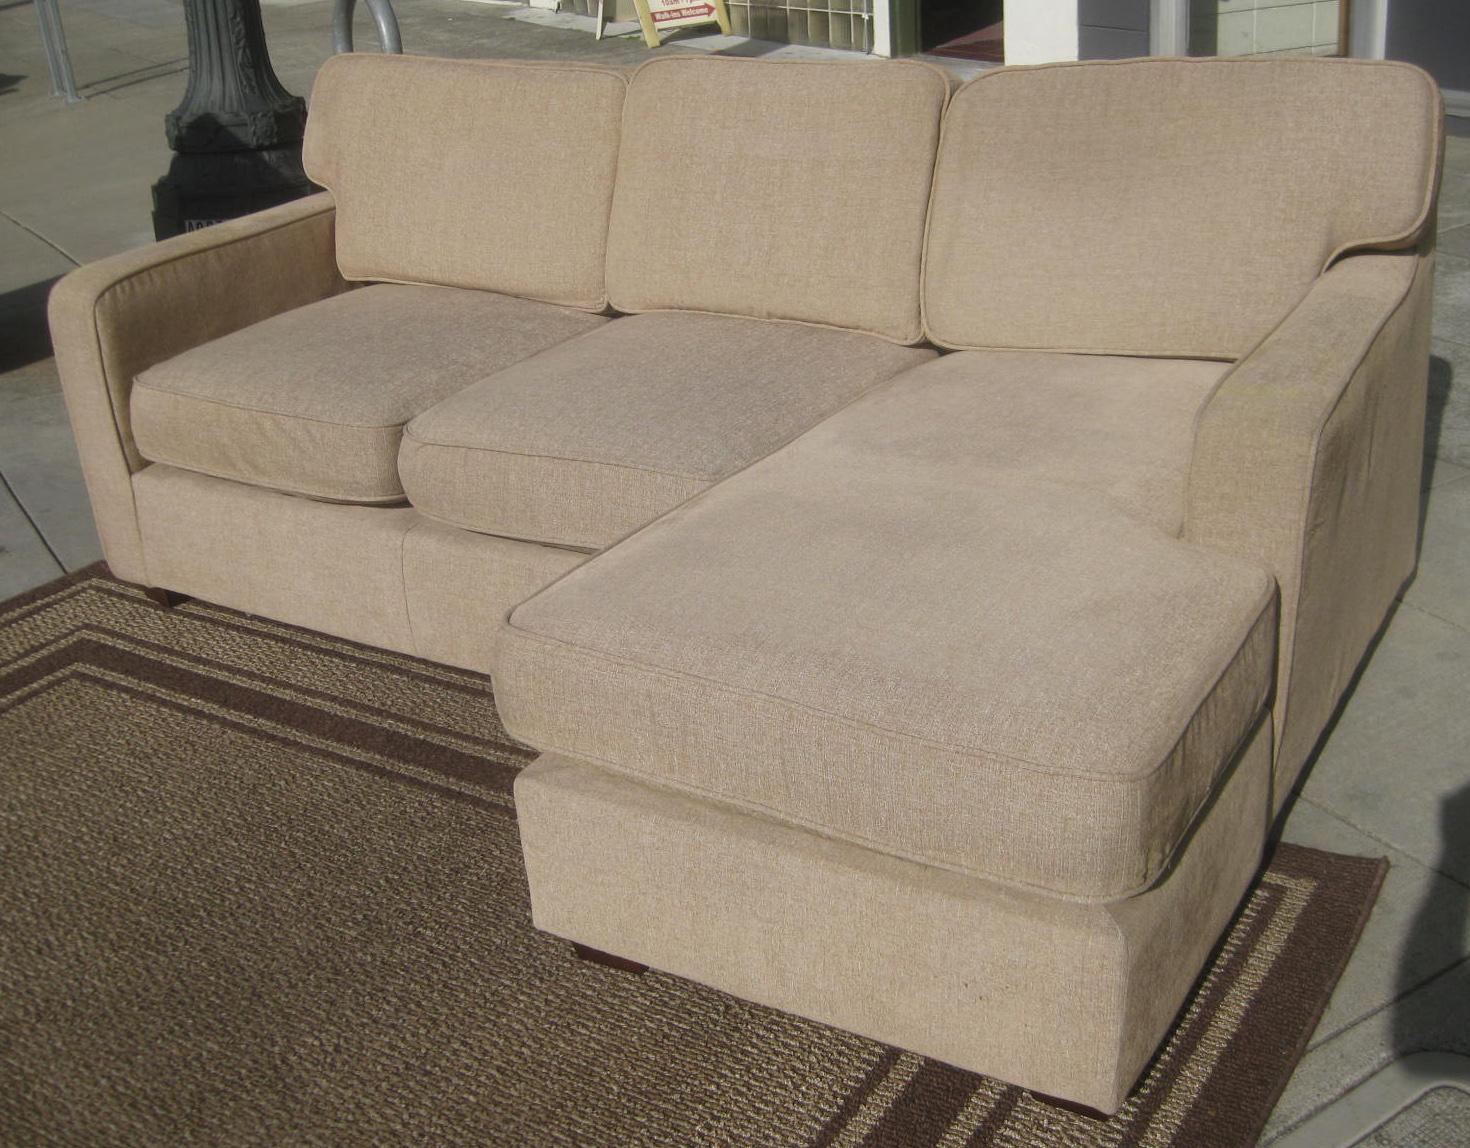 uhuru furniture collectibles sold scrumptious beige. Black Bedroom Furniture Sets. Home Design Ideas